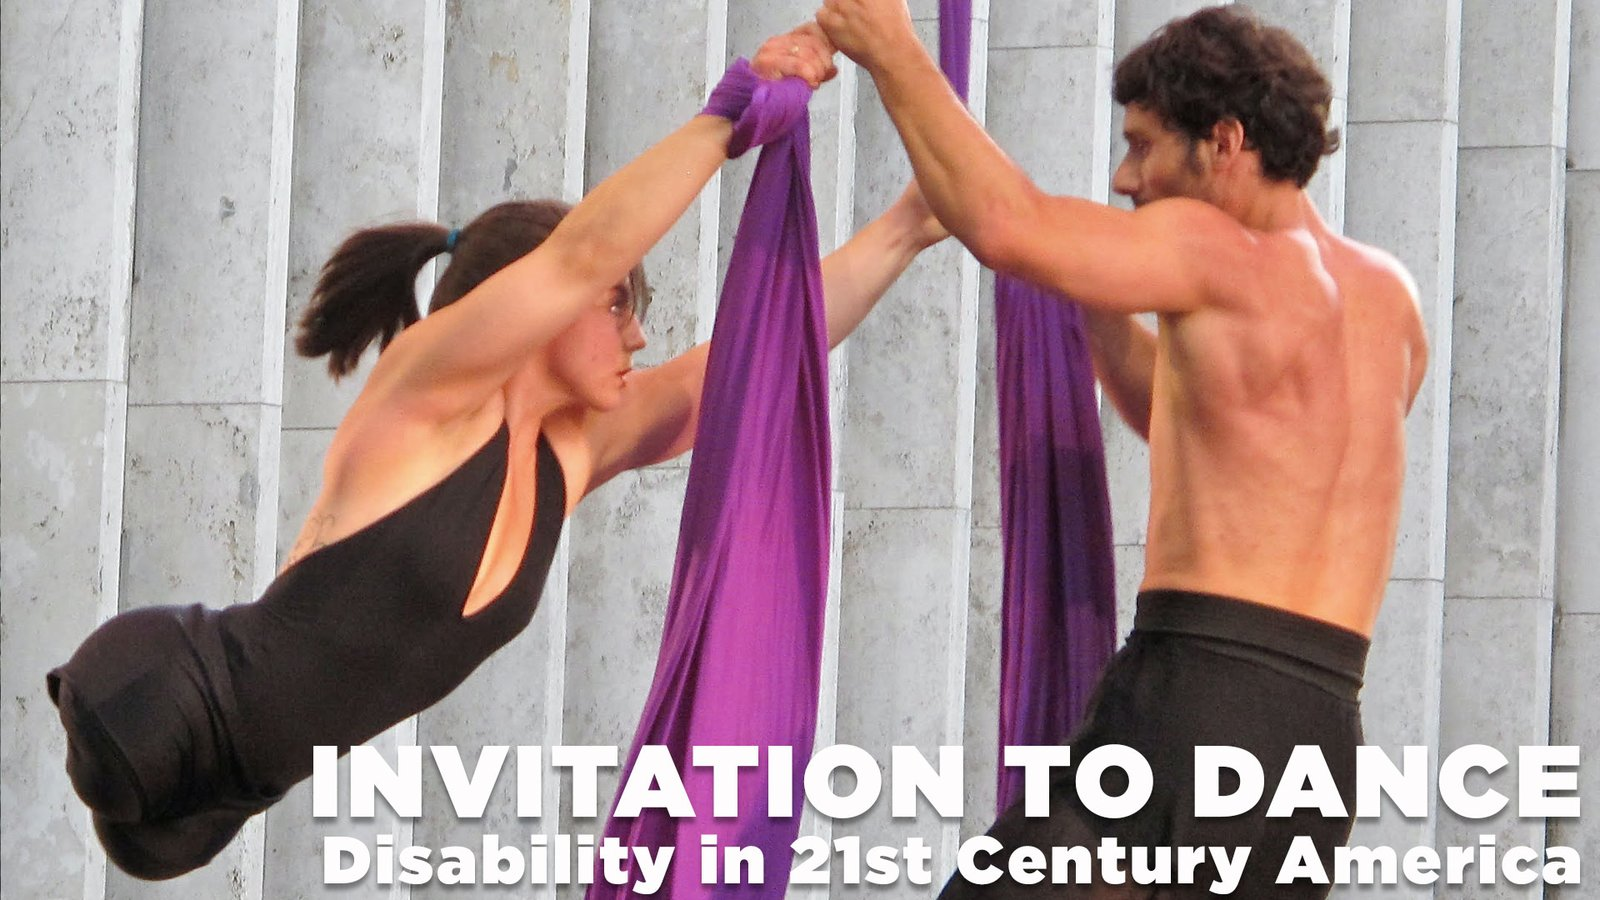 Invitation to Dance - Disability in 21st Century America